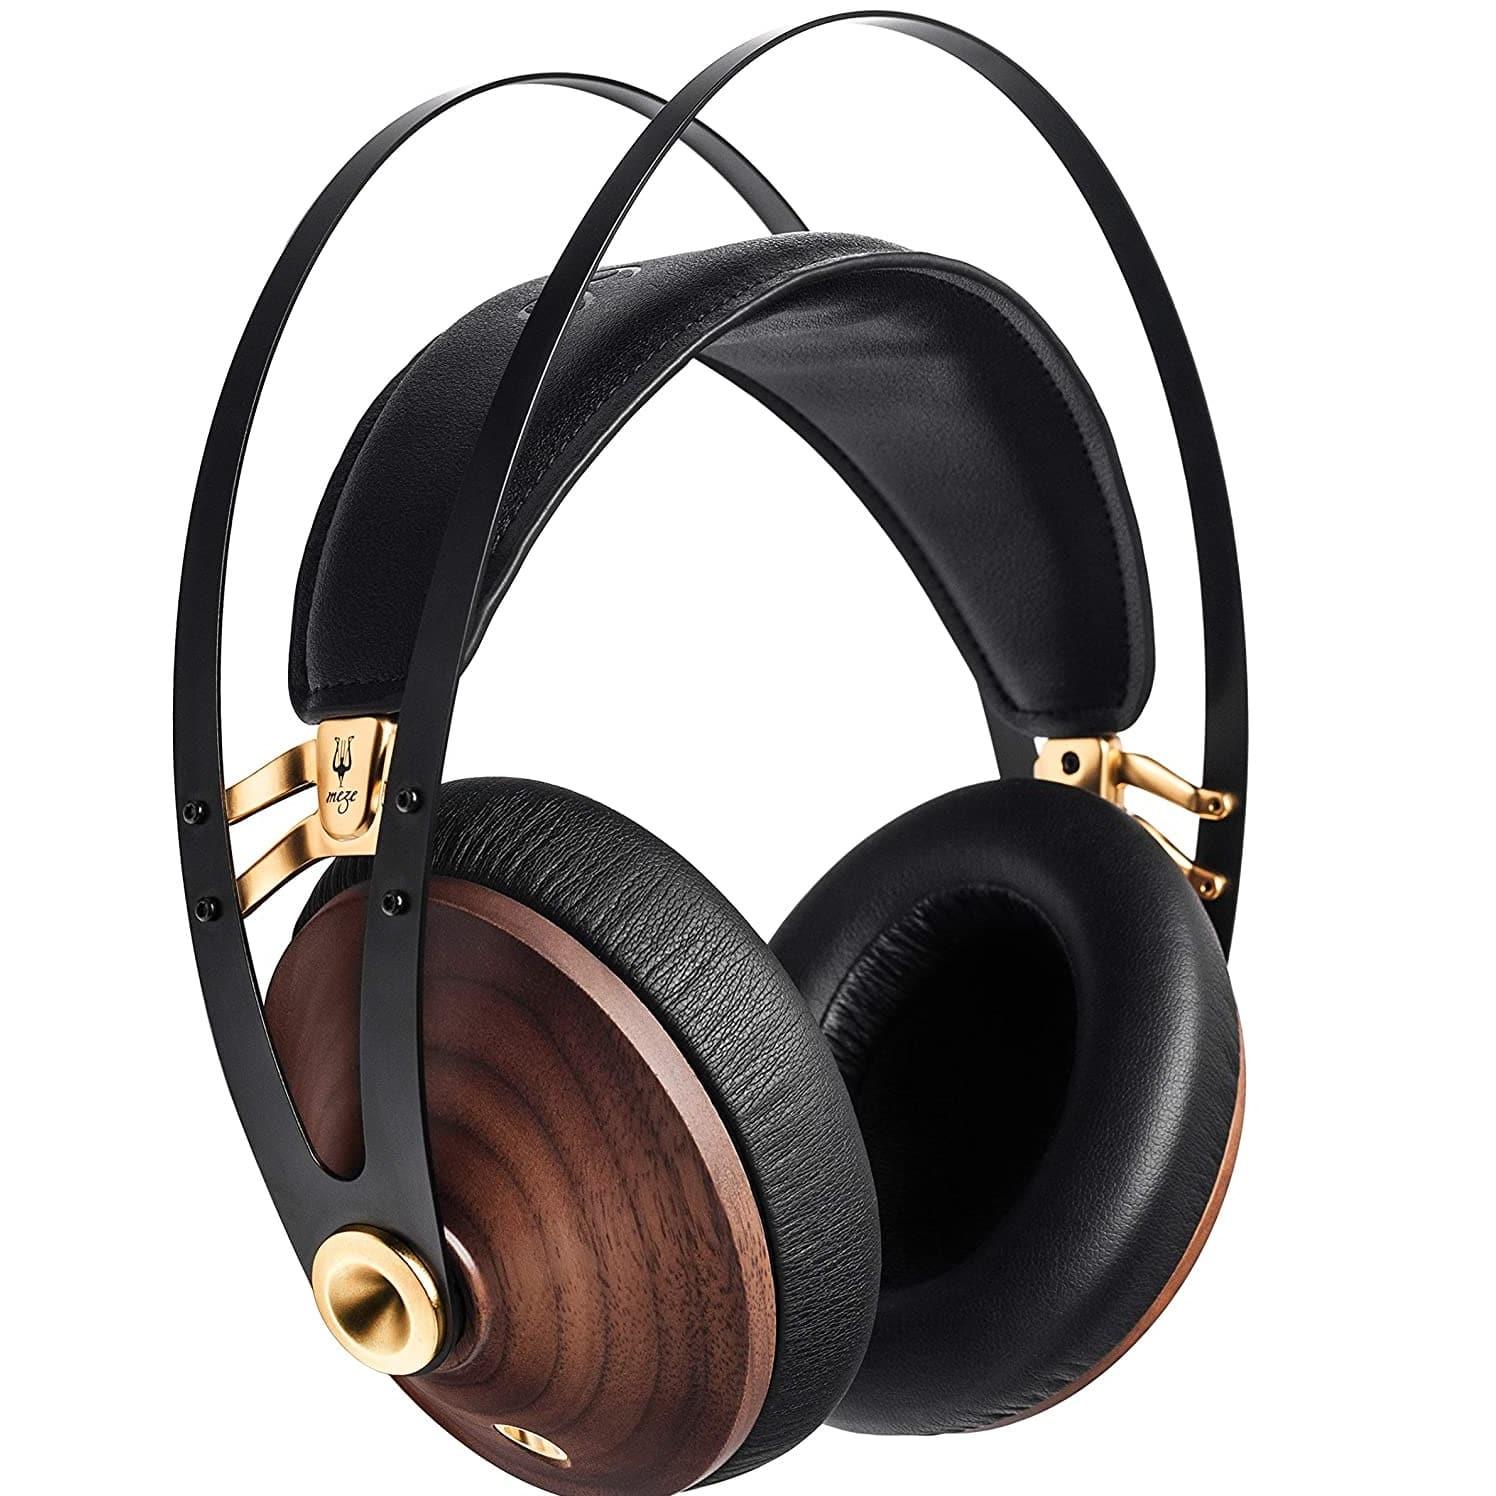 Meze 99 Classics Over-ear Headphones (Walnut Gold): A Complete Review